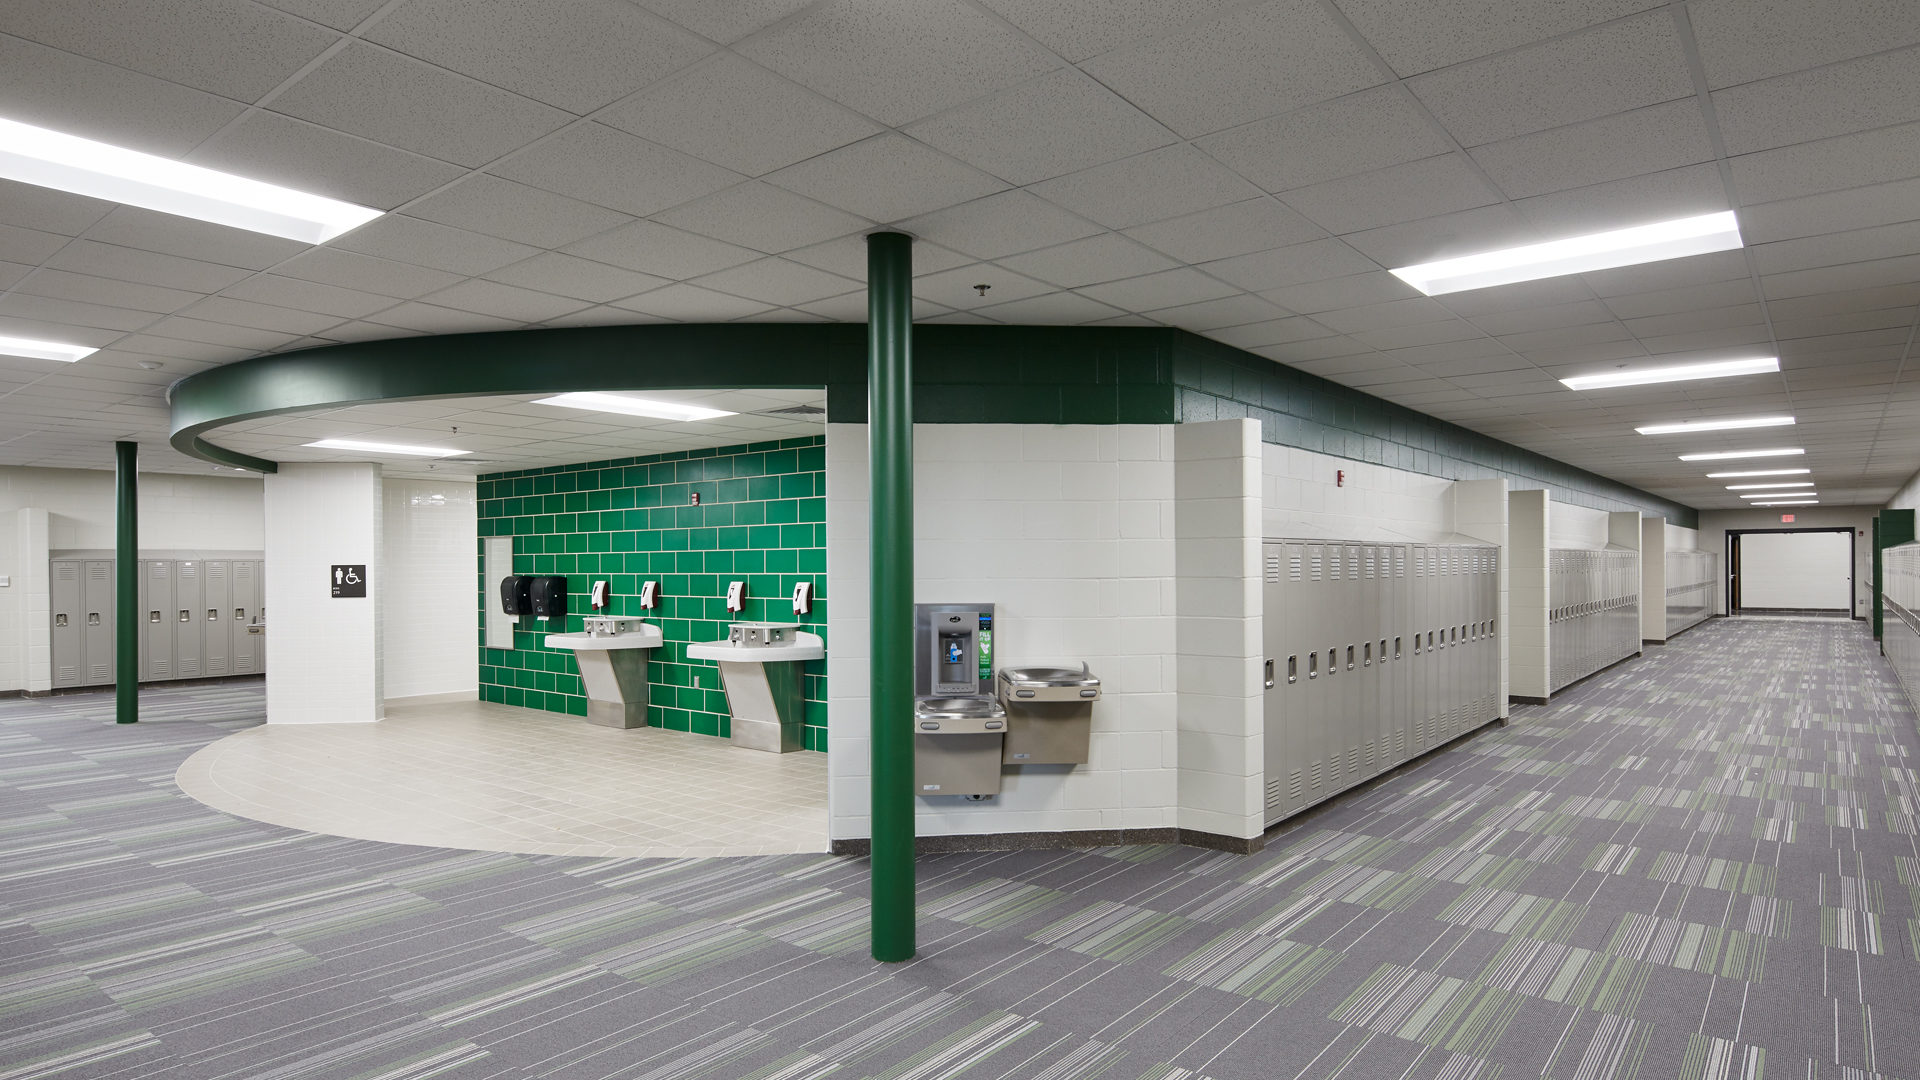 Pine Island Elementary School Pine Island MN View of Bathroom Wash Station and Hallways